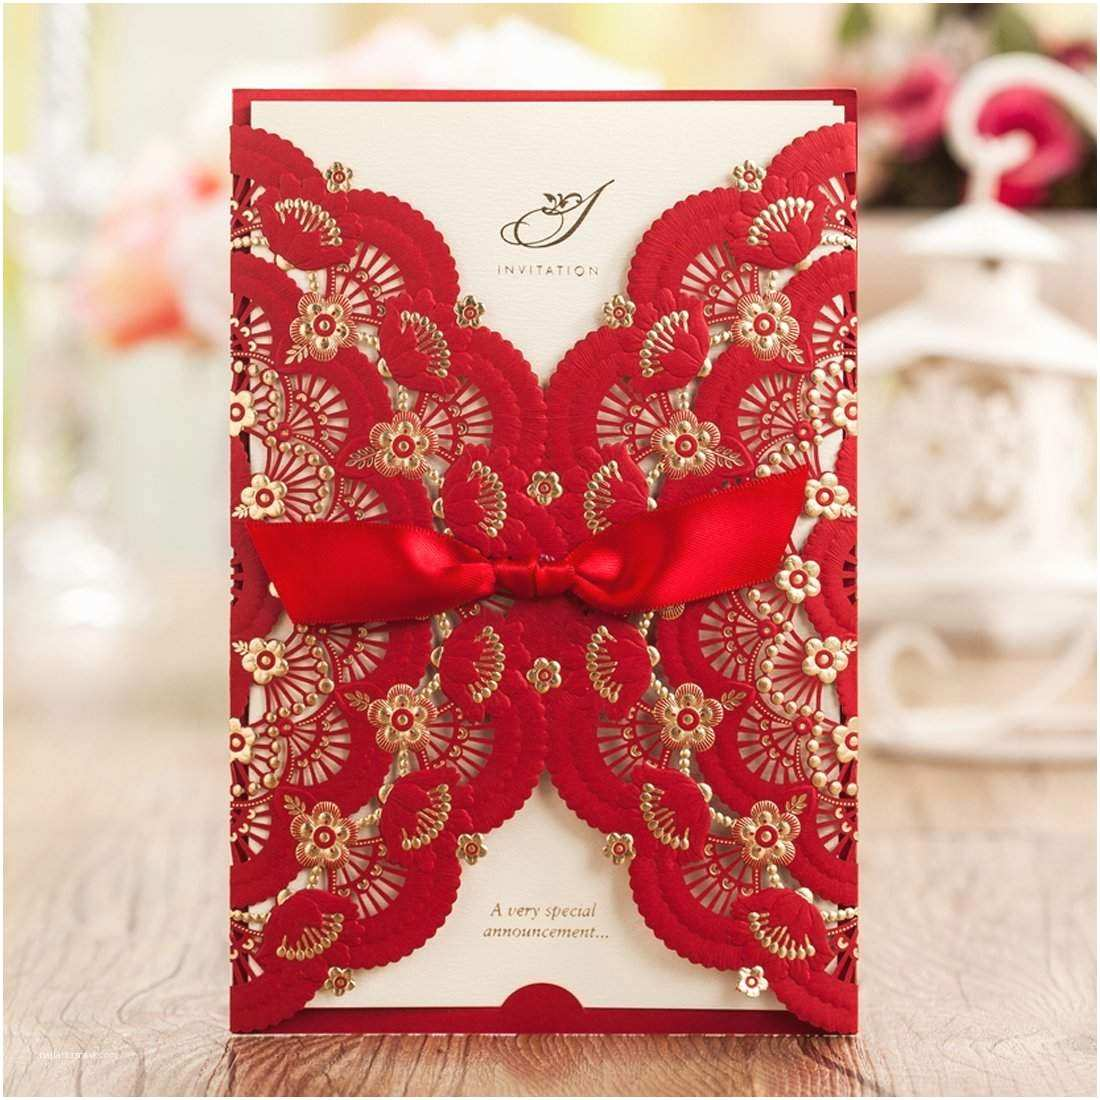 Cheap Diy Wedding Invitations top 10 Best Cheap Diy Wedding Invitations